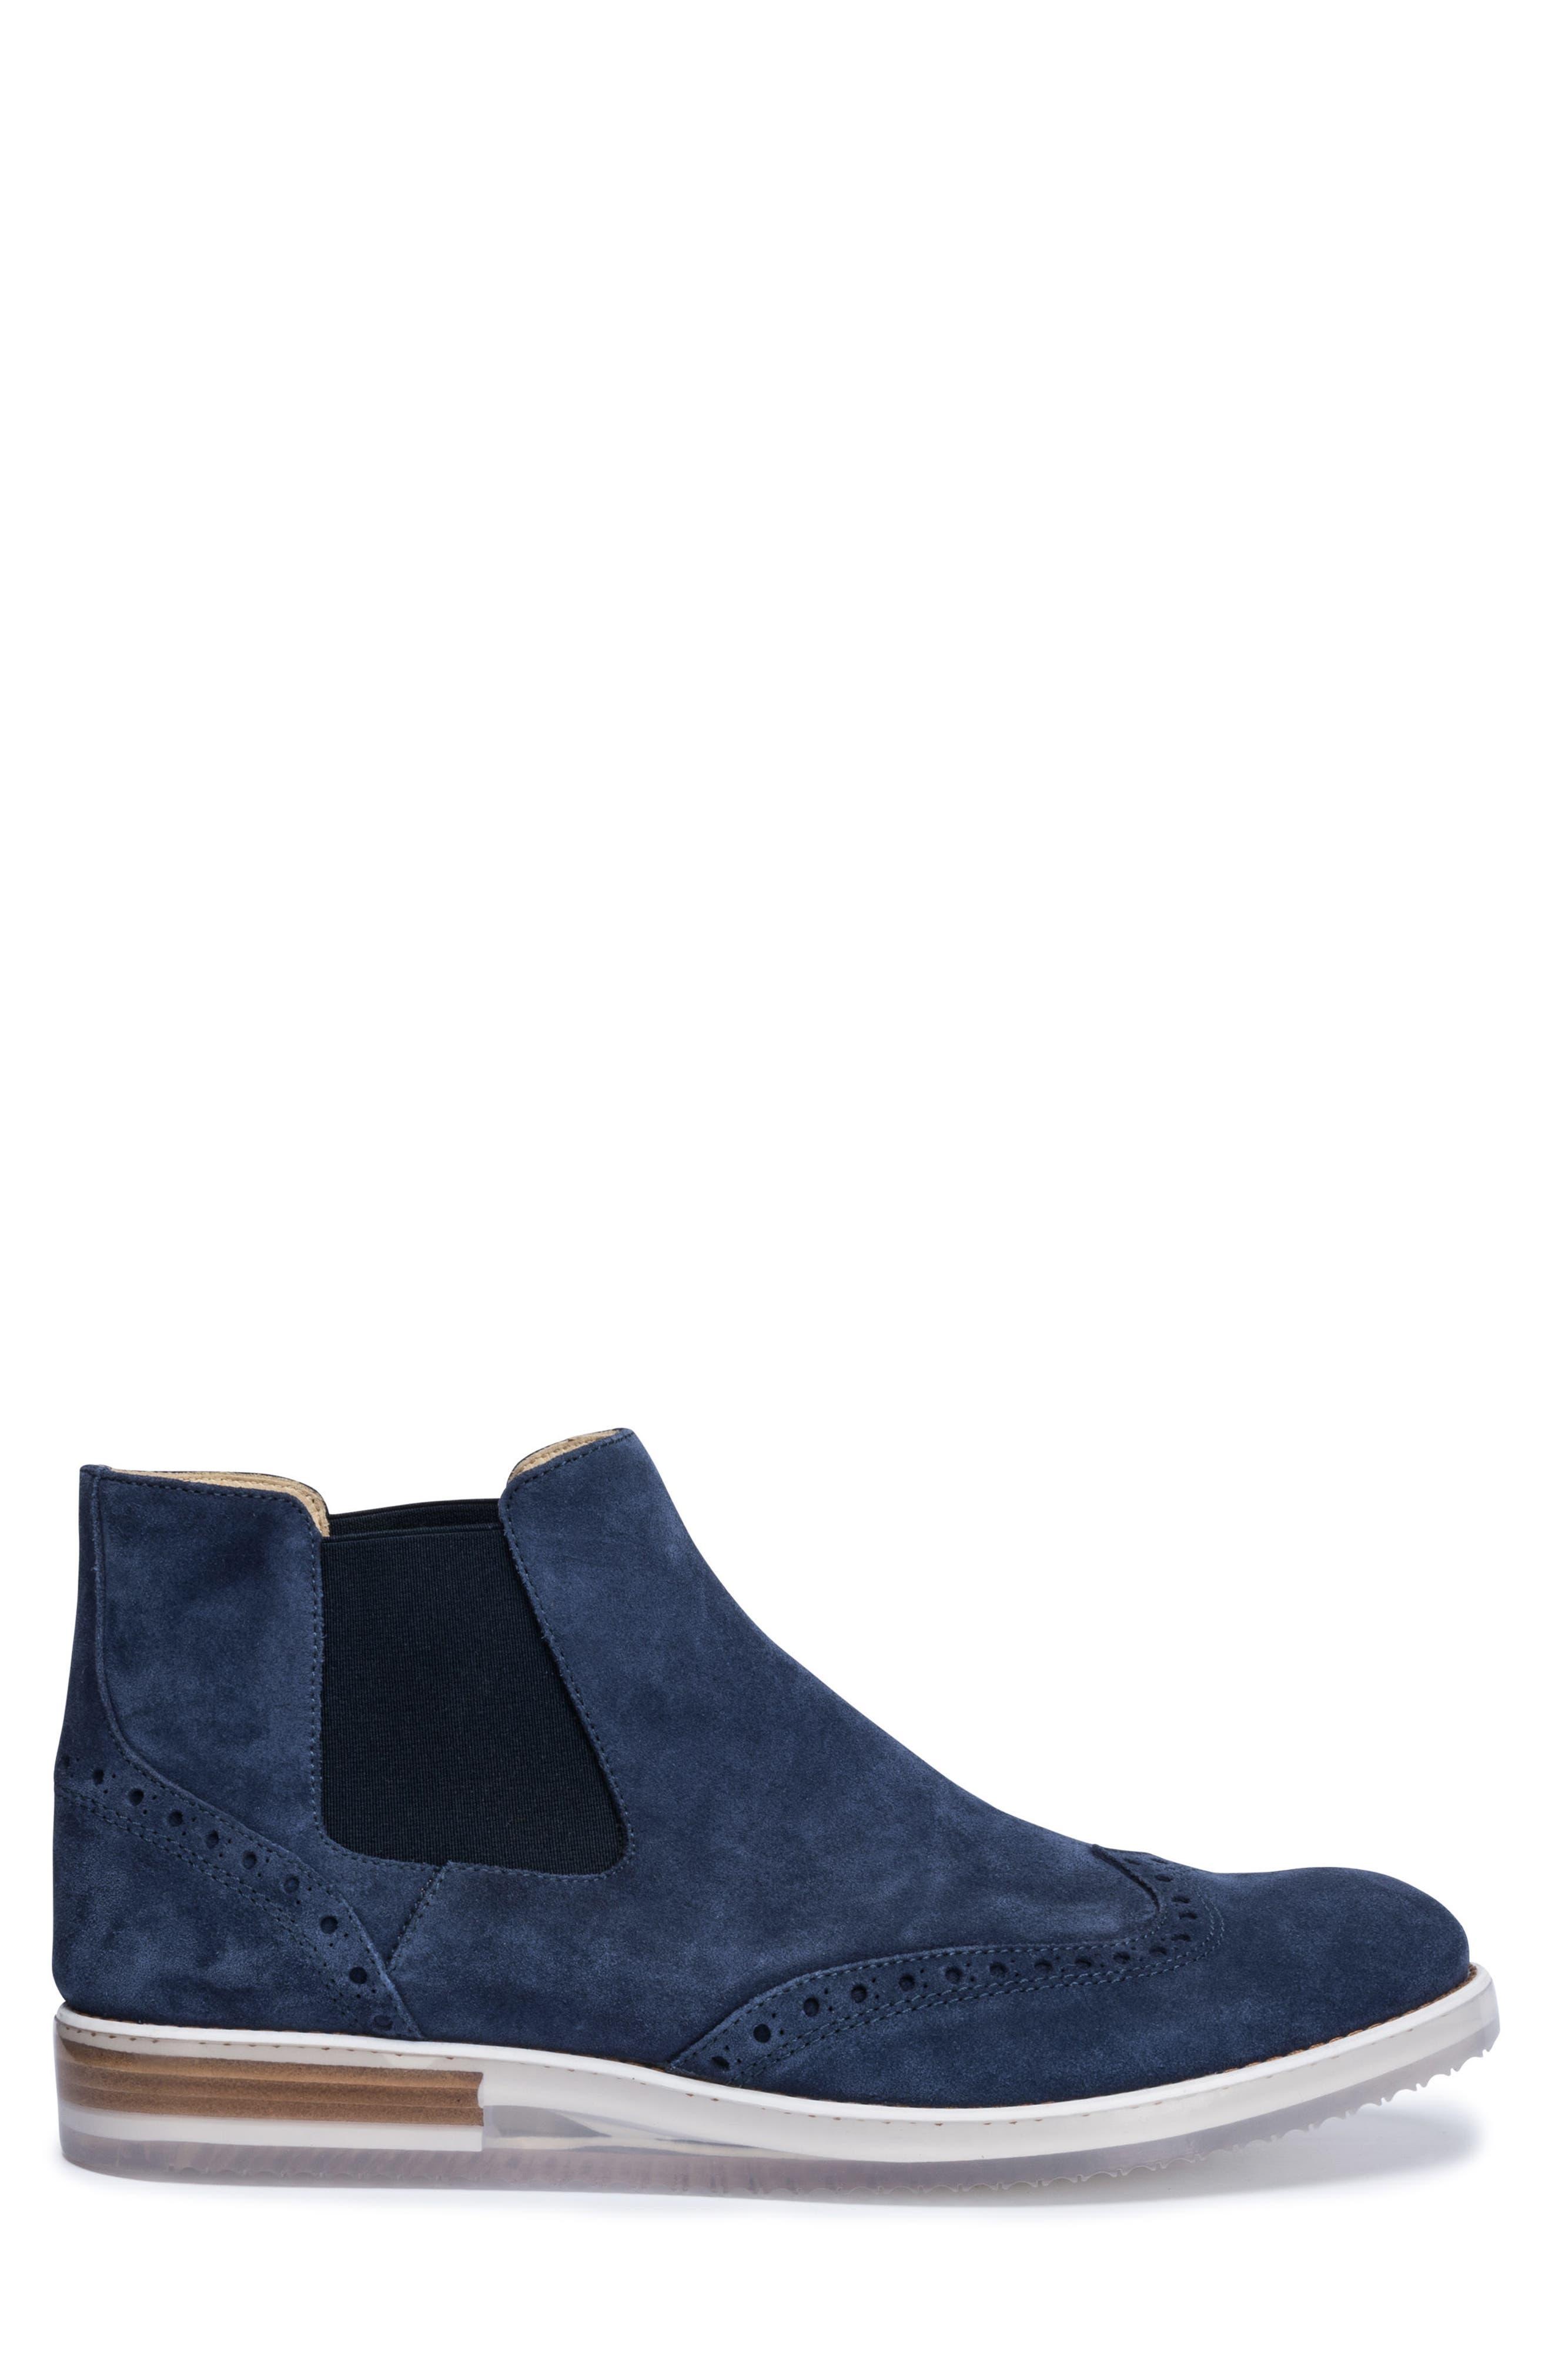 Brescia Mid Chelsea Wingtip Sneaker Boot,                             Alternate thumbnail 3, color,                             429